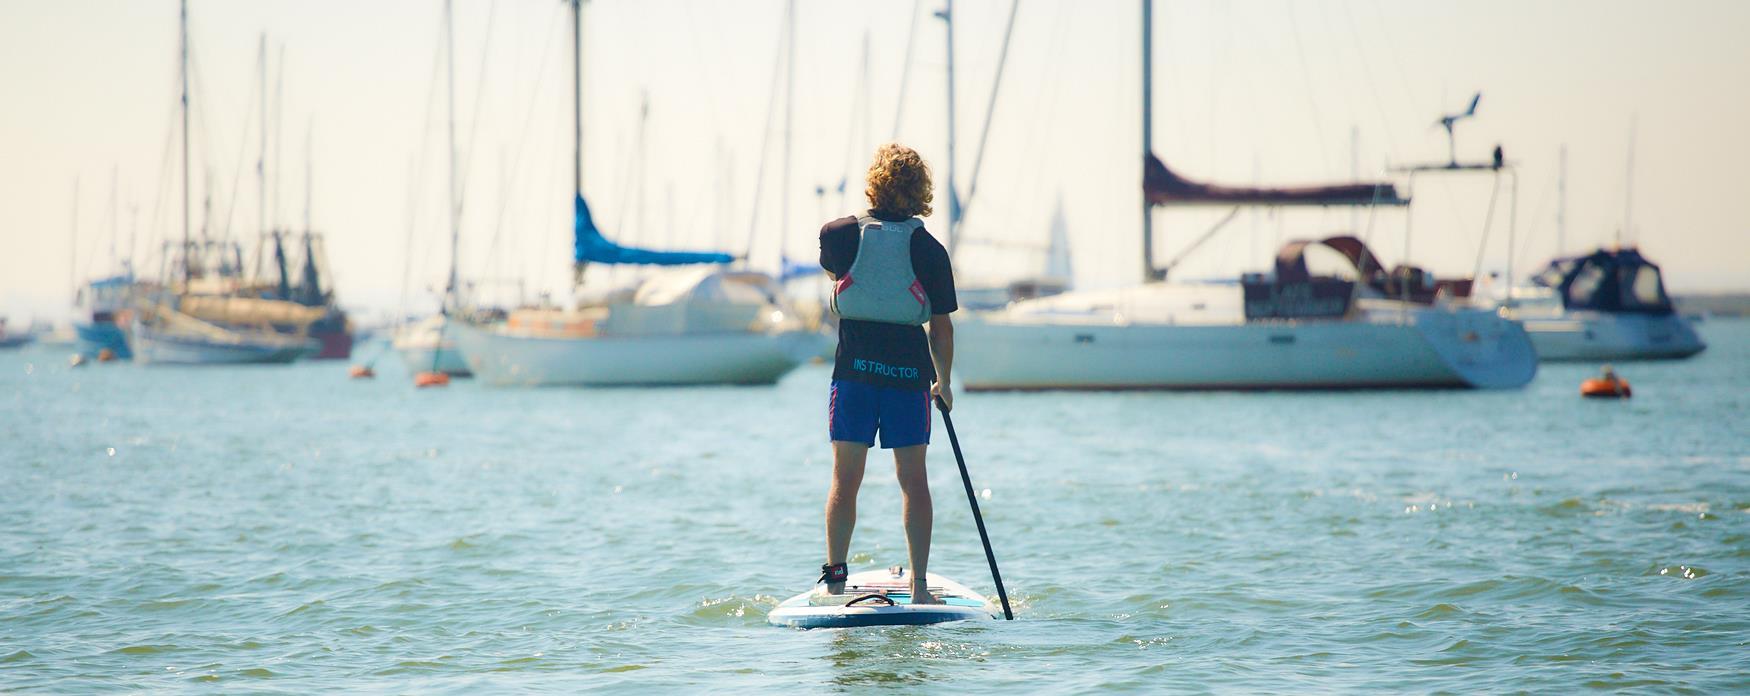 Paddleboarding @ Mersea Island